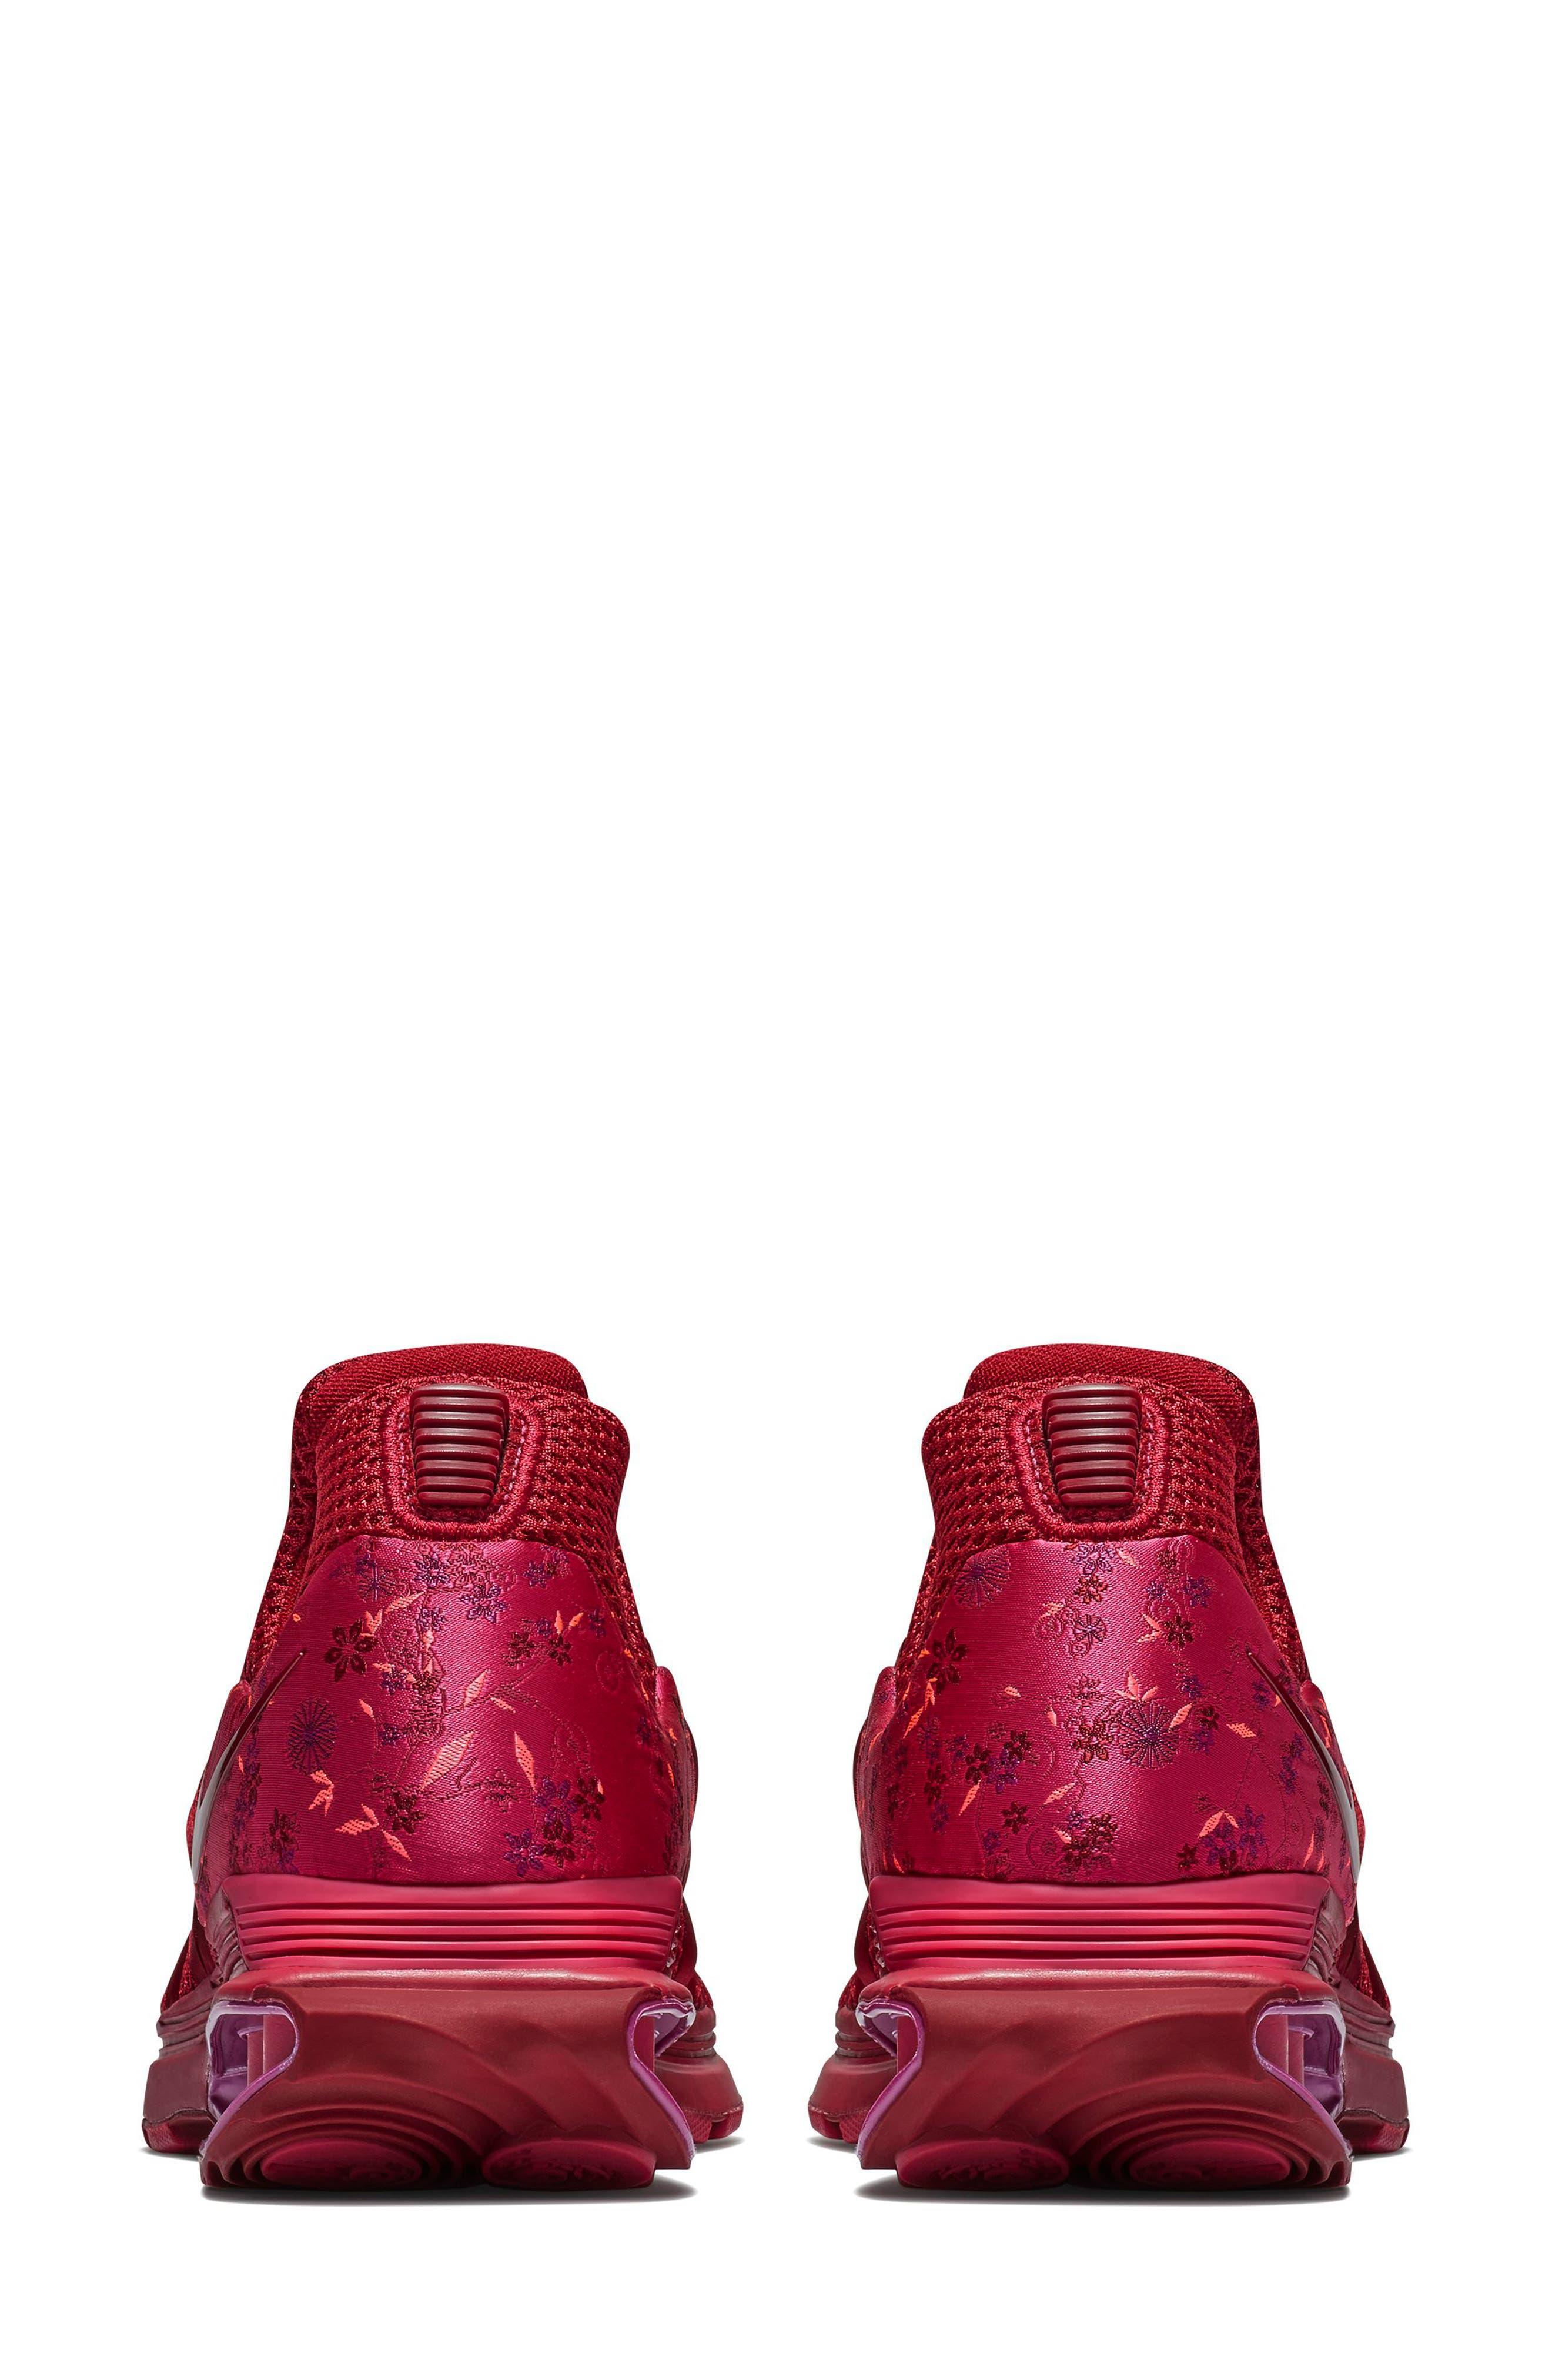 Shox Gravity Sneaker,                             Alternate thumbnail 5, color,